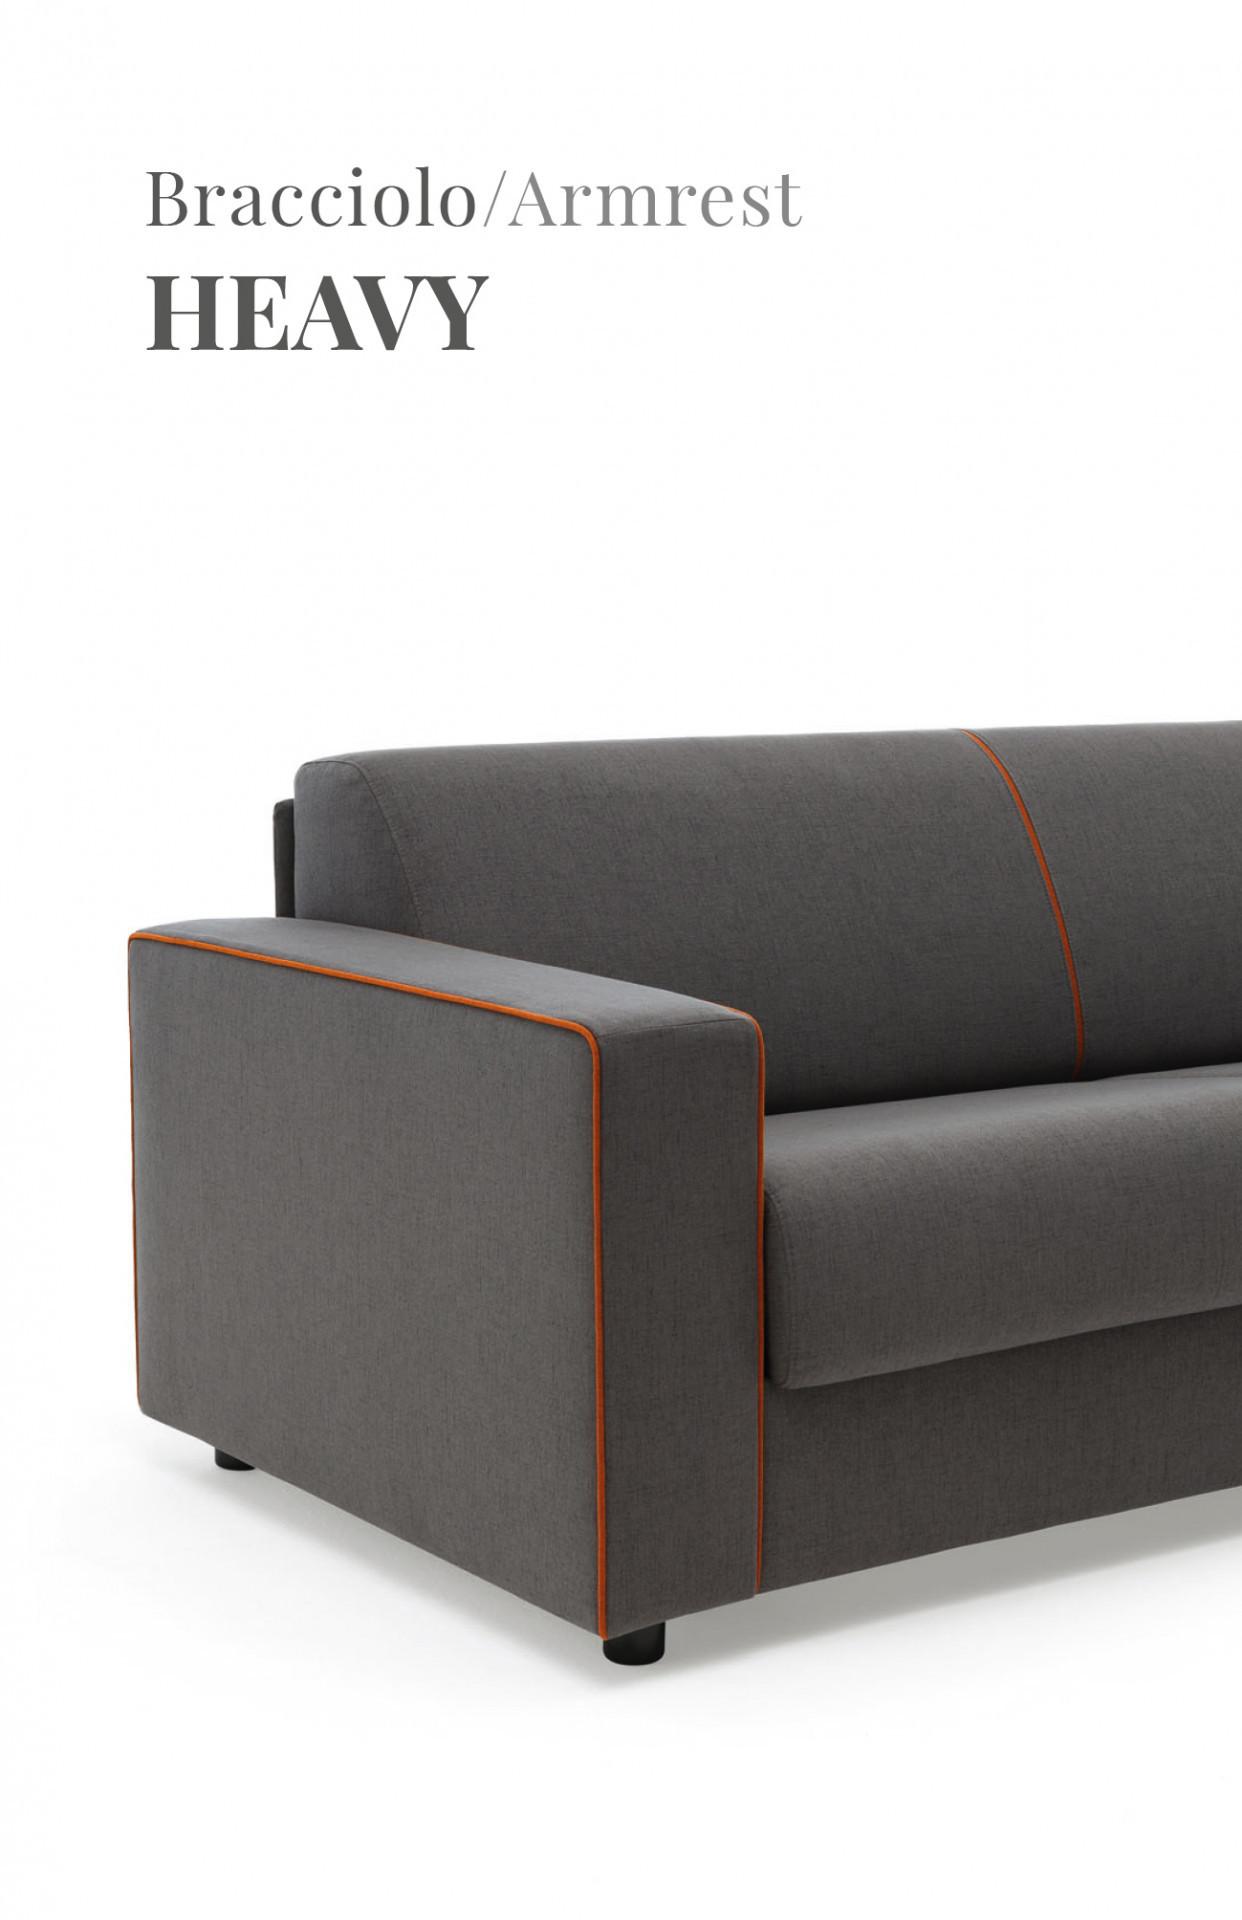 Sofa beds in fabric - Madeira | LeComfort